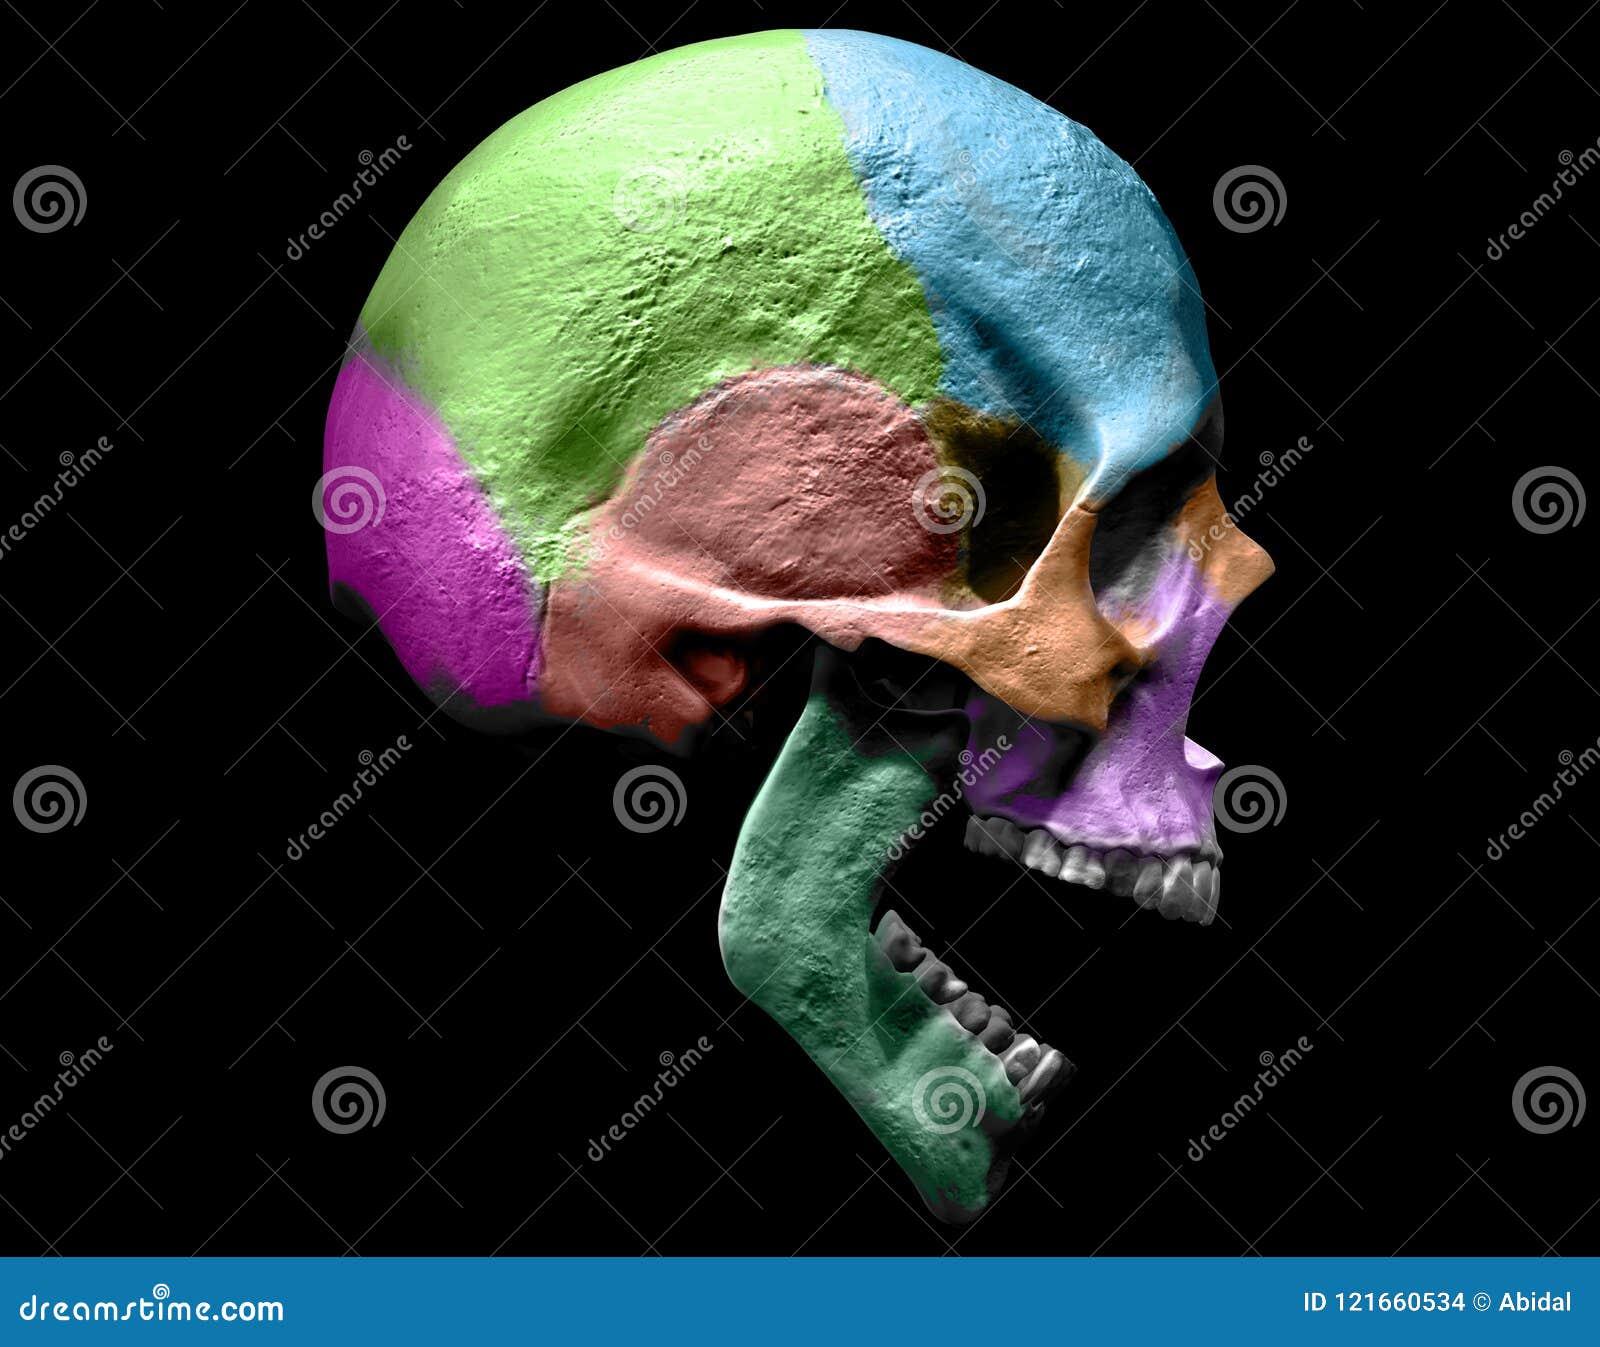 Human Skull Anatomy, 3D Rendering Stock Illustration - Illustration ...